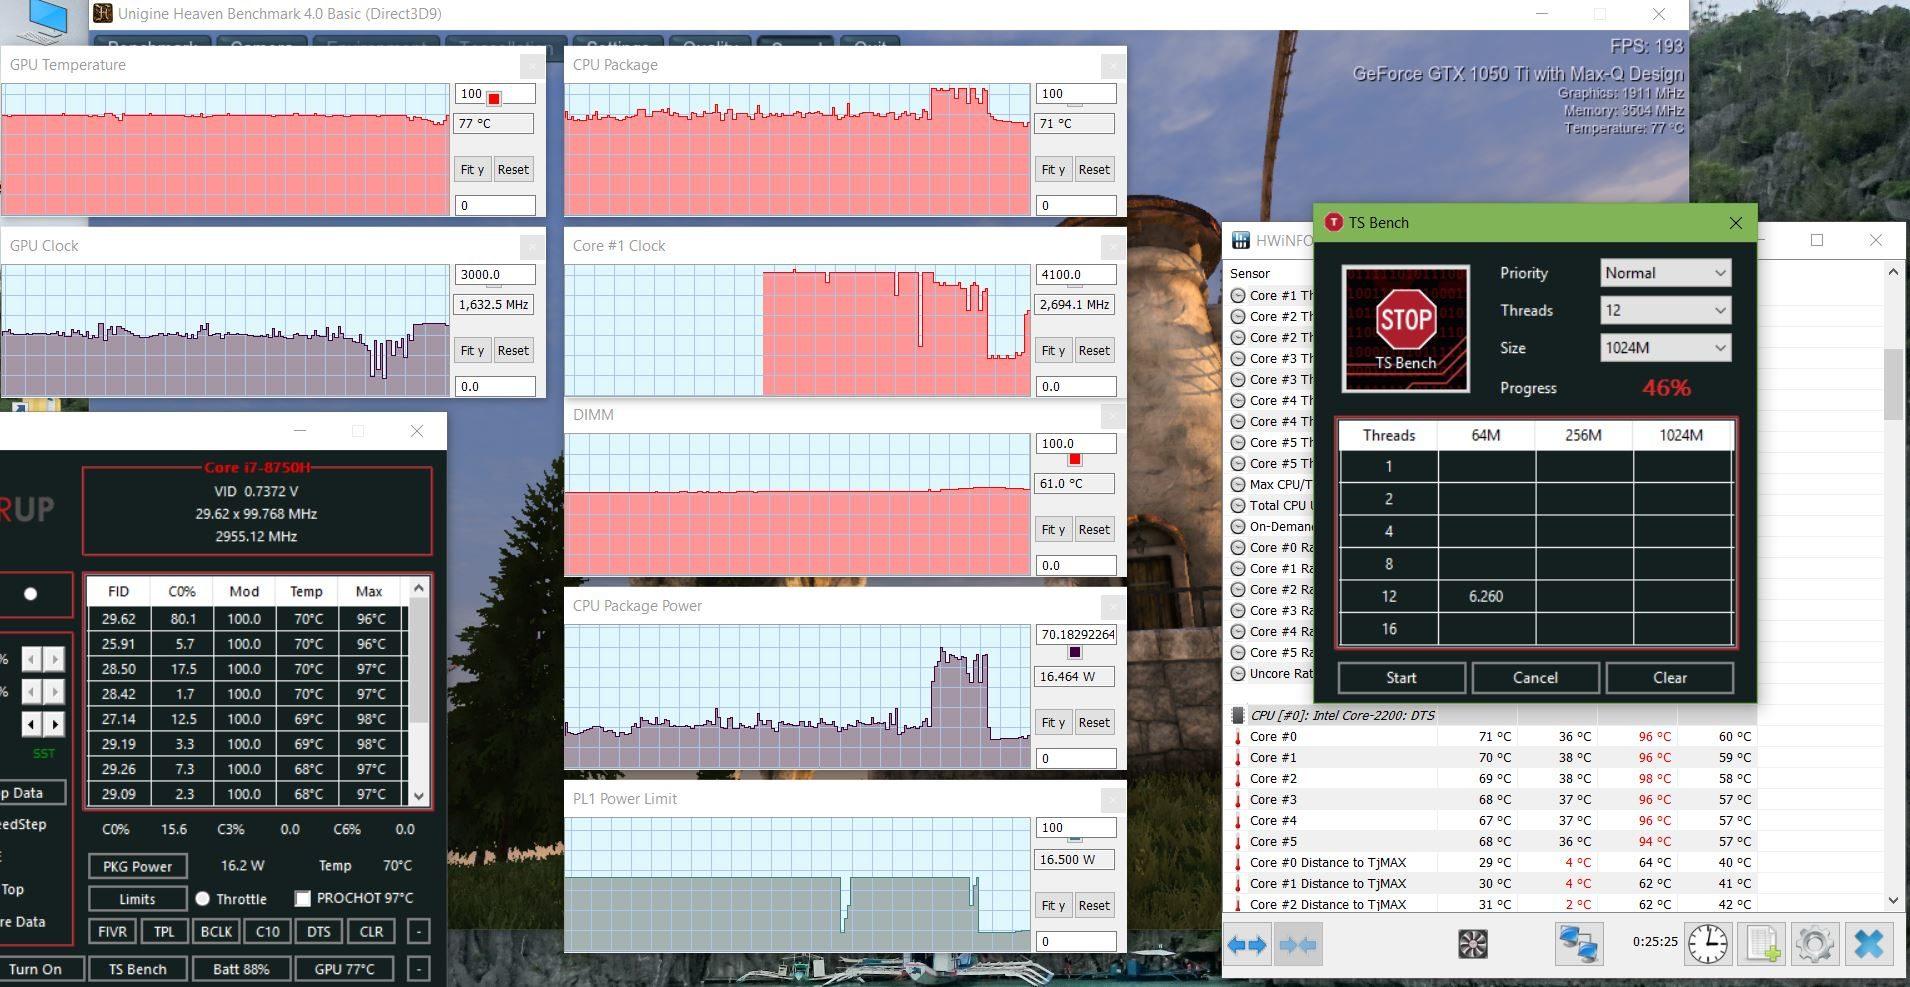 Dell XPS 15 9570 review (i7-8750H, GTX 1050 Ti Max-Q, FHD screen